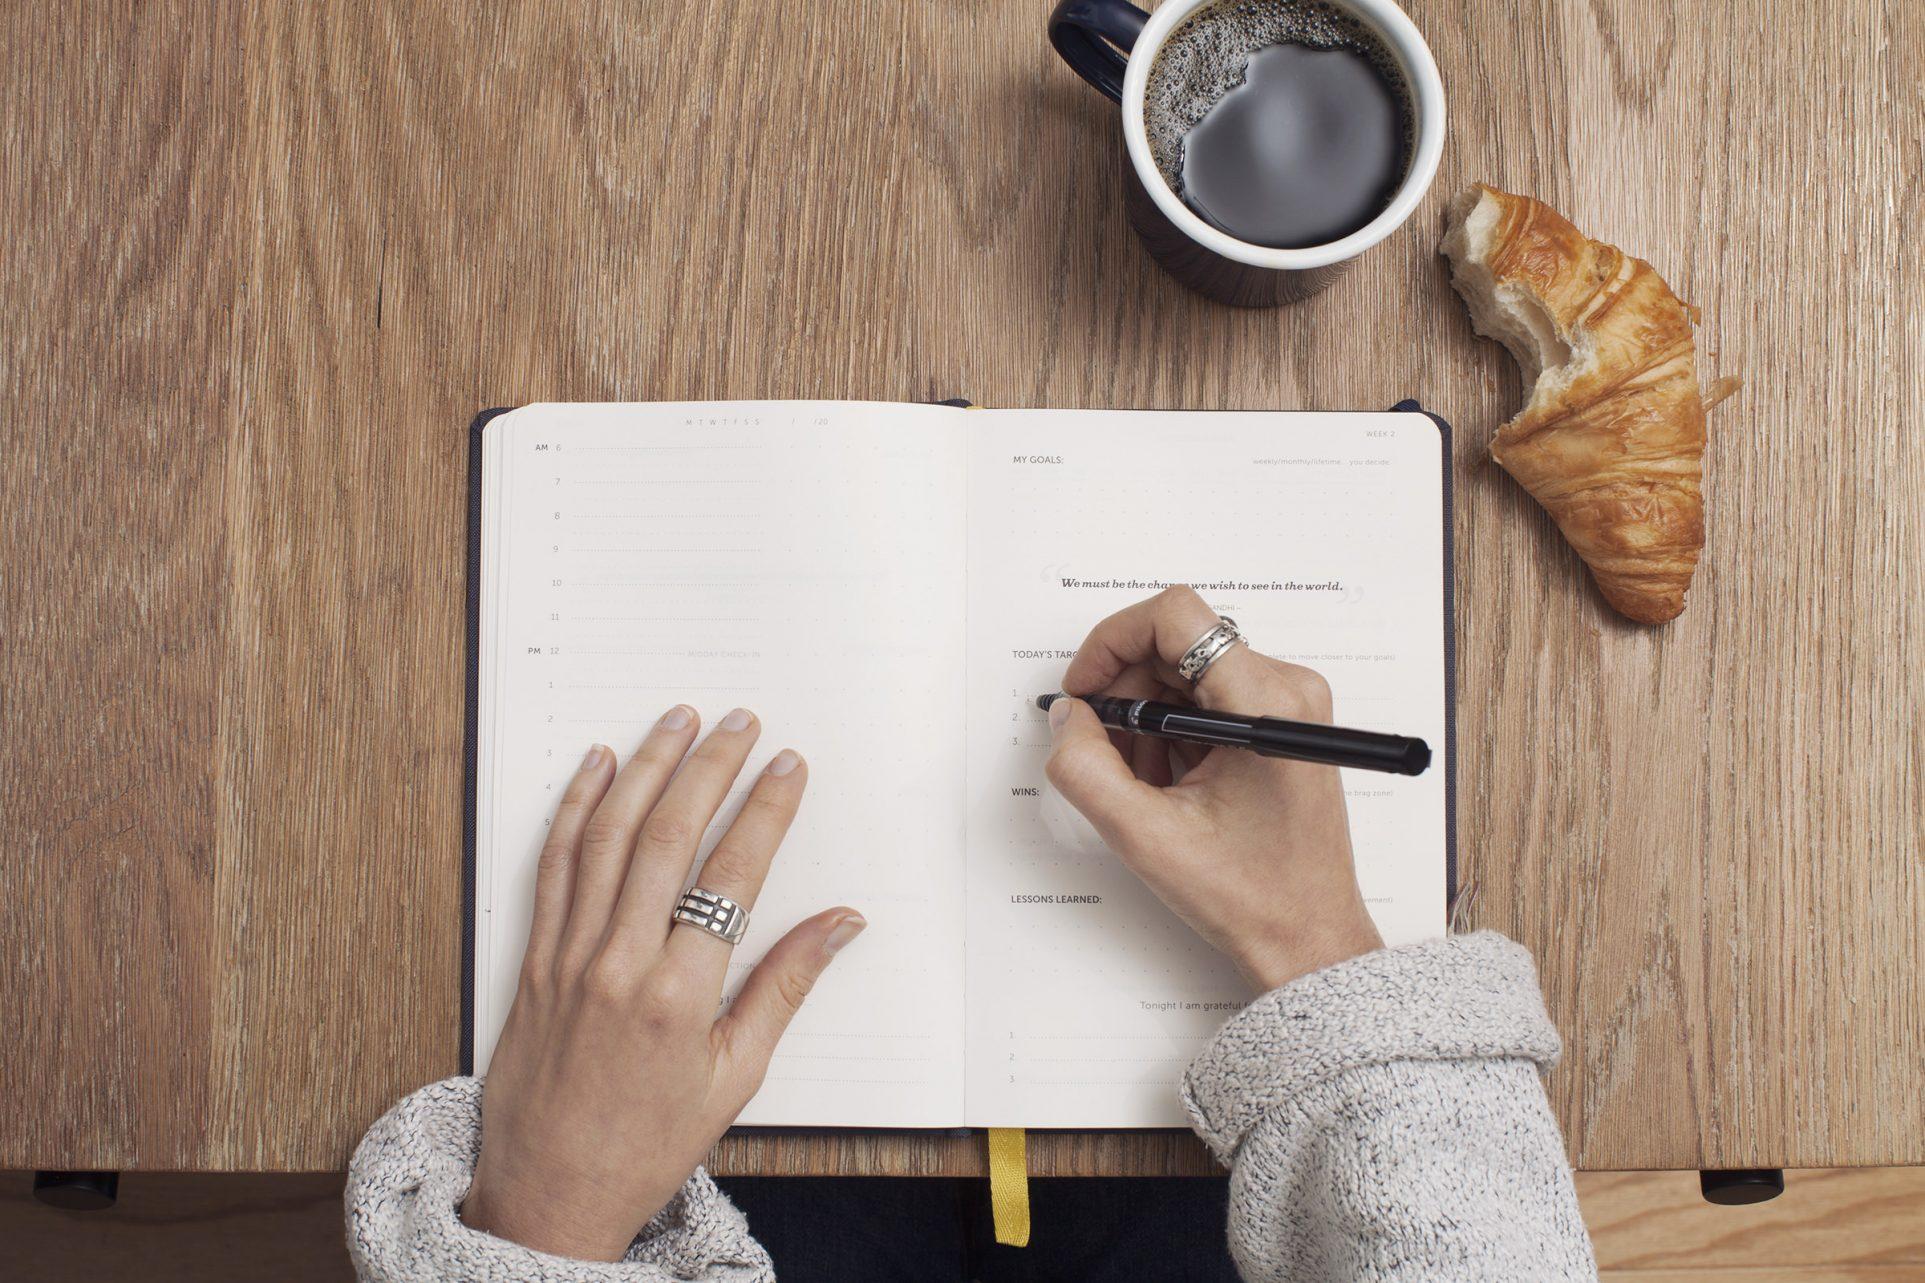 10 Easy Blogging Tips From Experts [Plus One Bonus Tip]